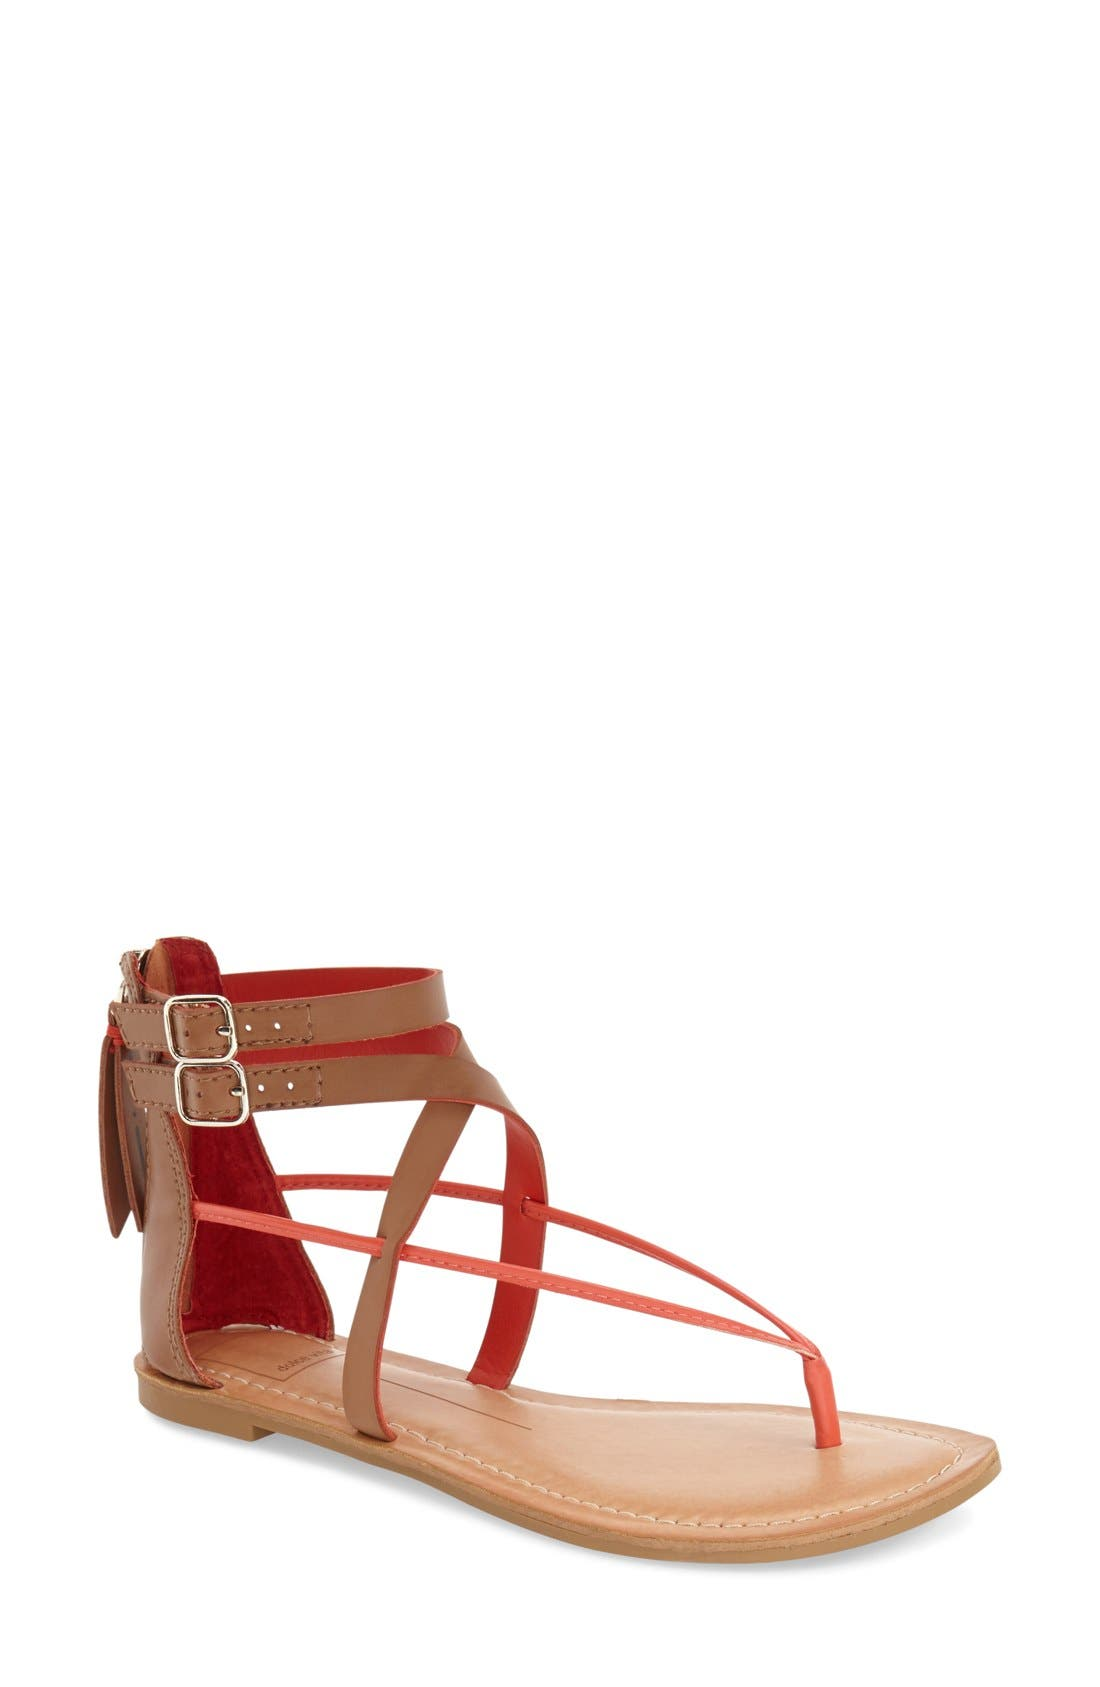 Alternate Image 1 Selected - Dolce Vita 'Darrah' Sandal (Women)